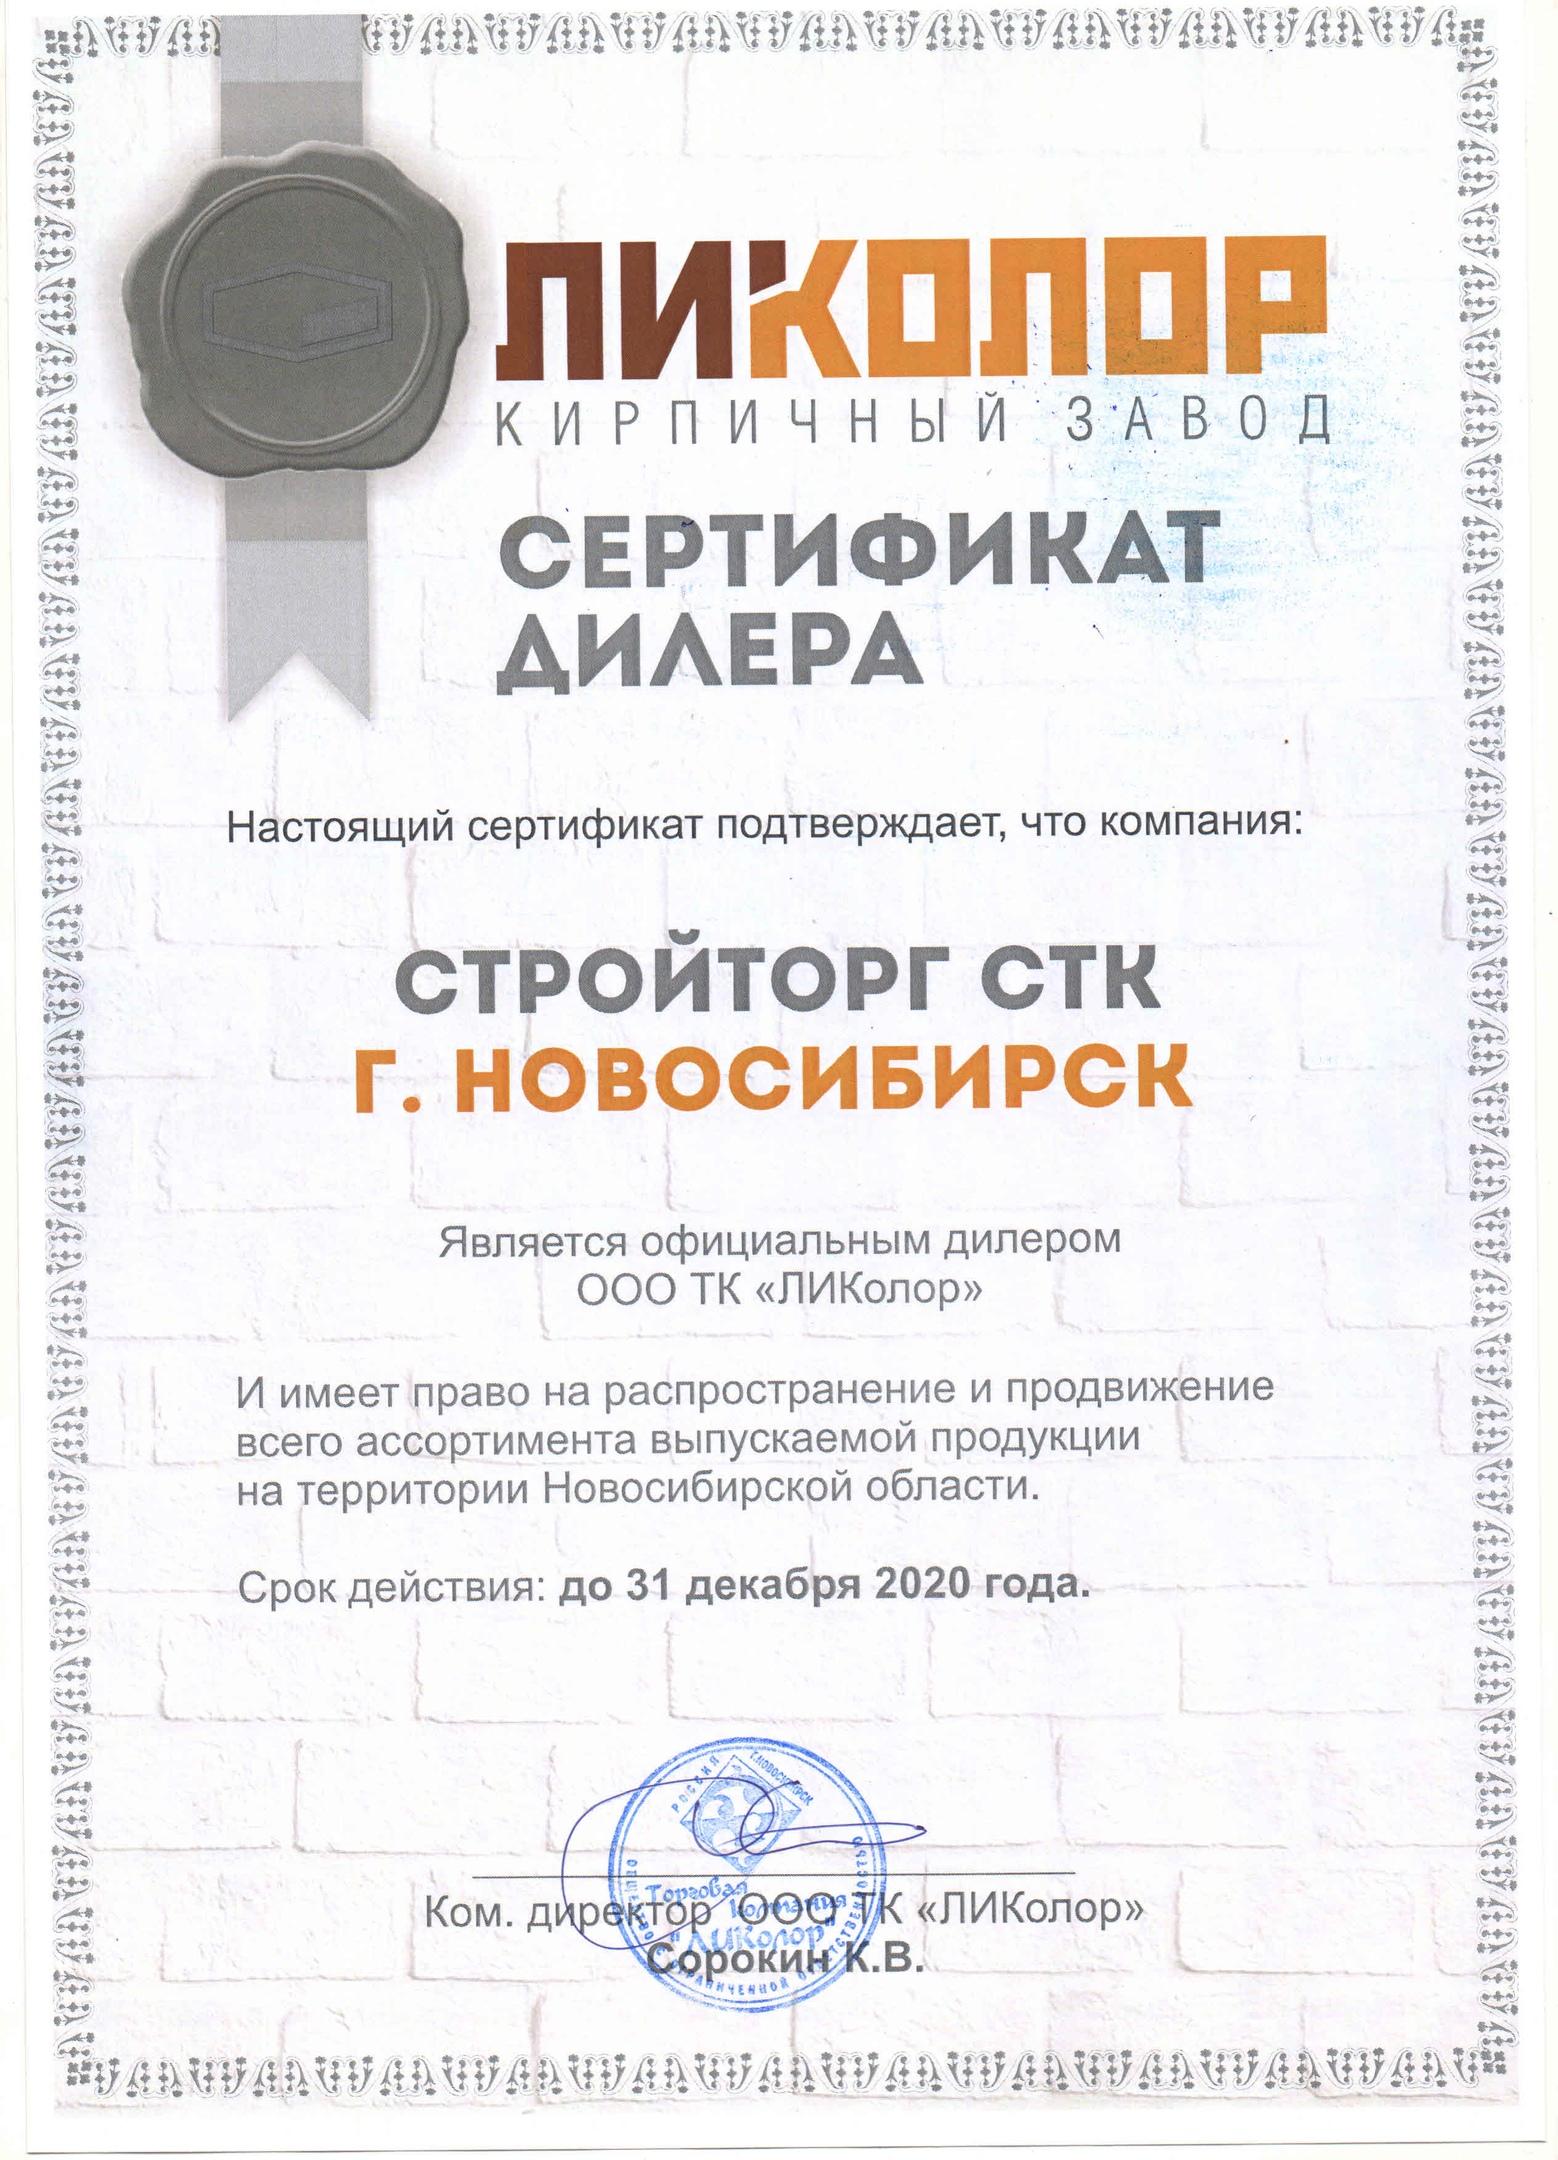 сертификат Завод Ликолор